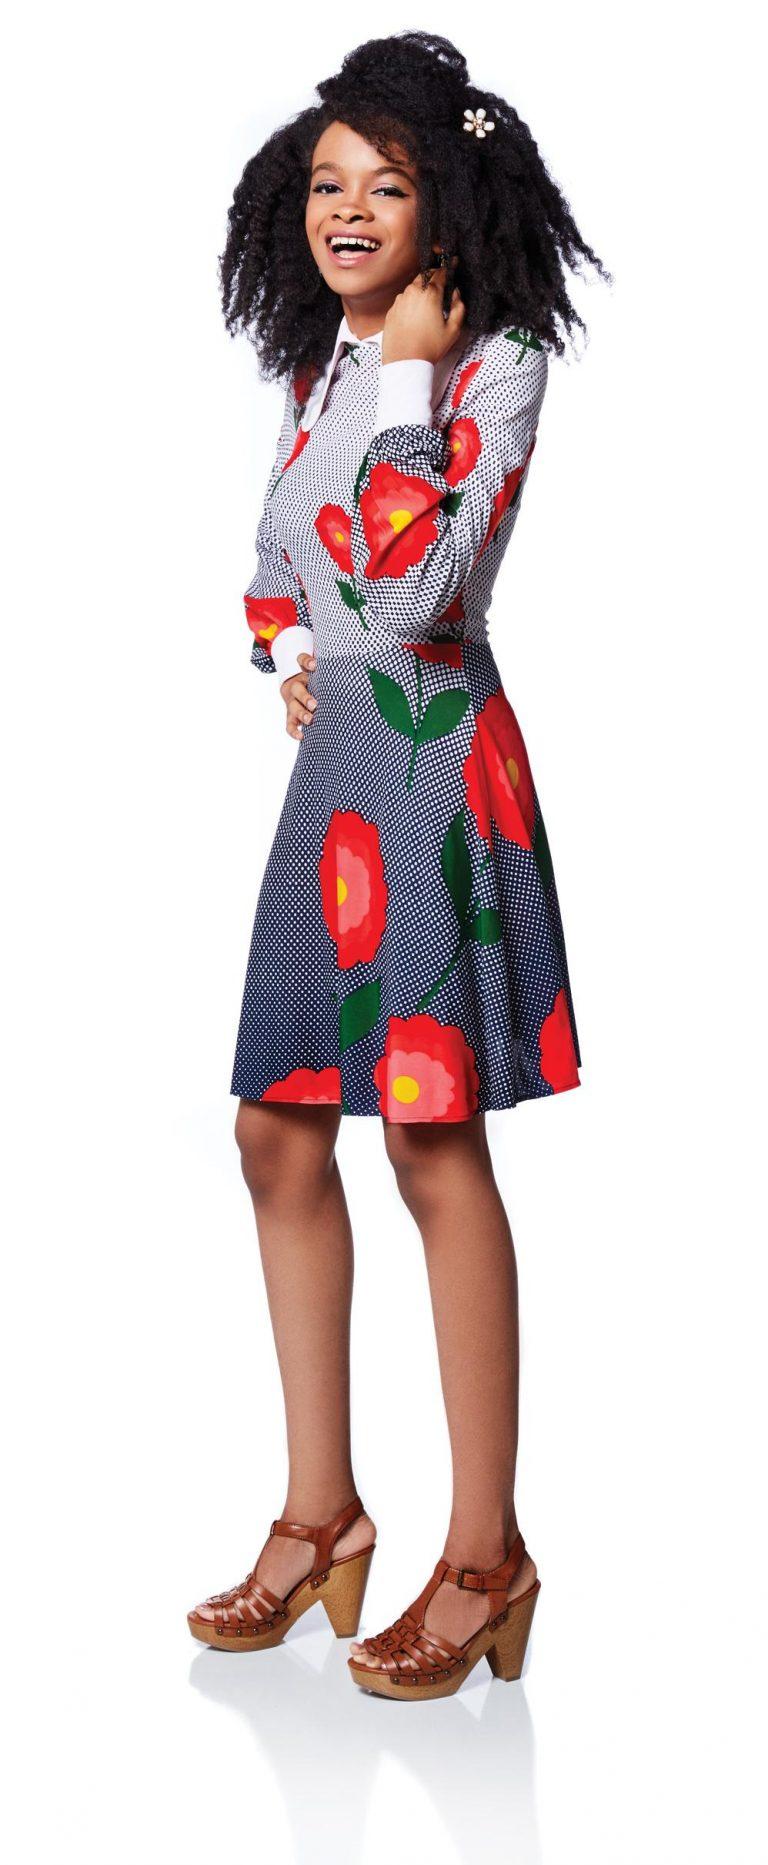 My Style: Maya Penn, owner of Maya's Ideas